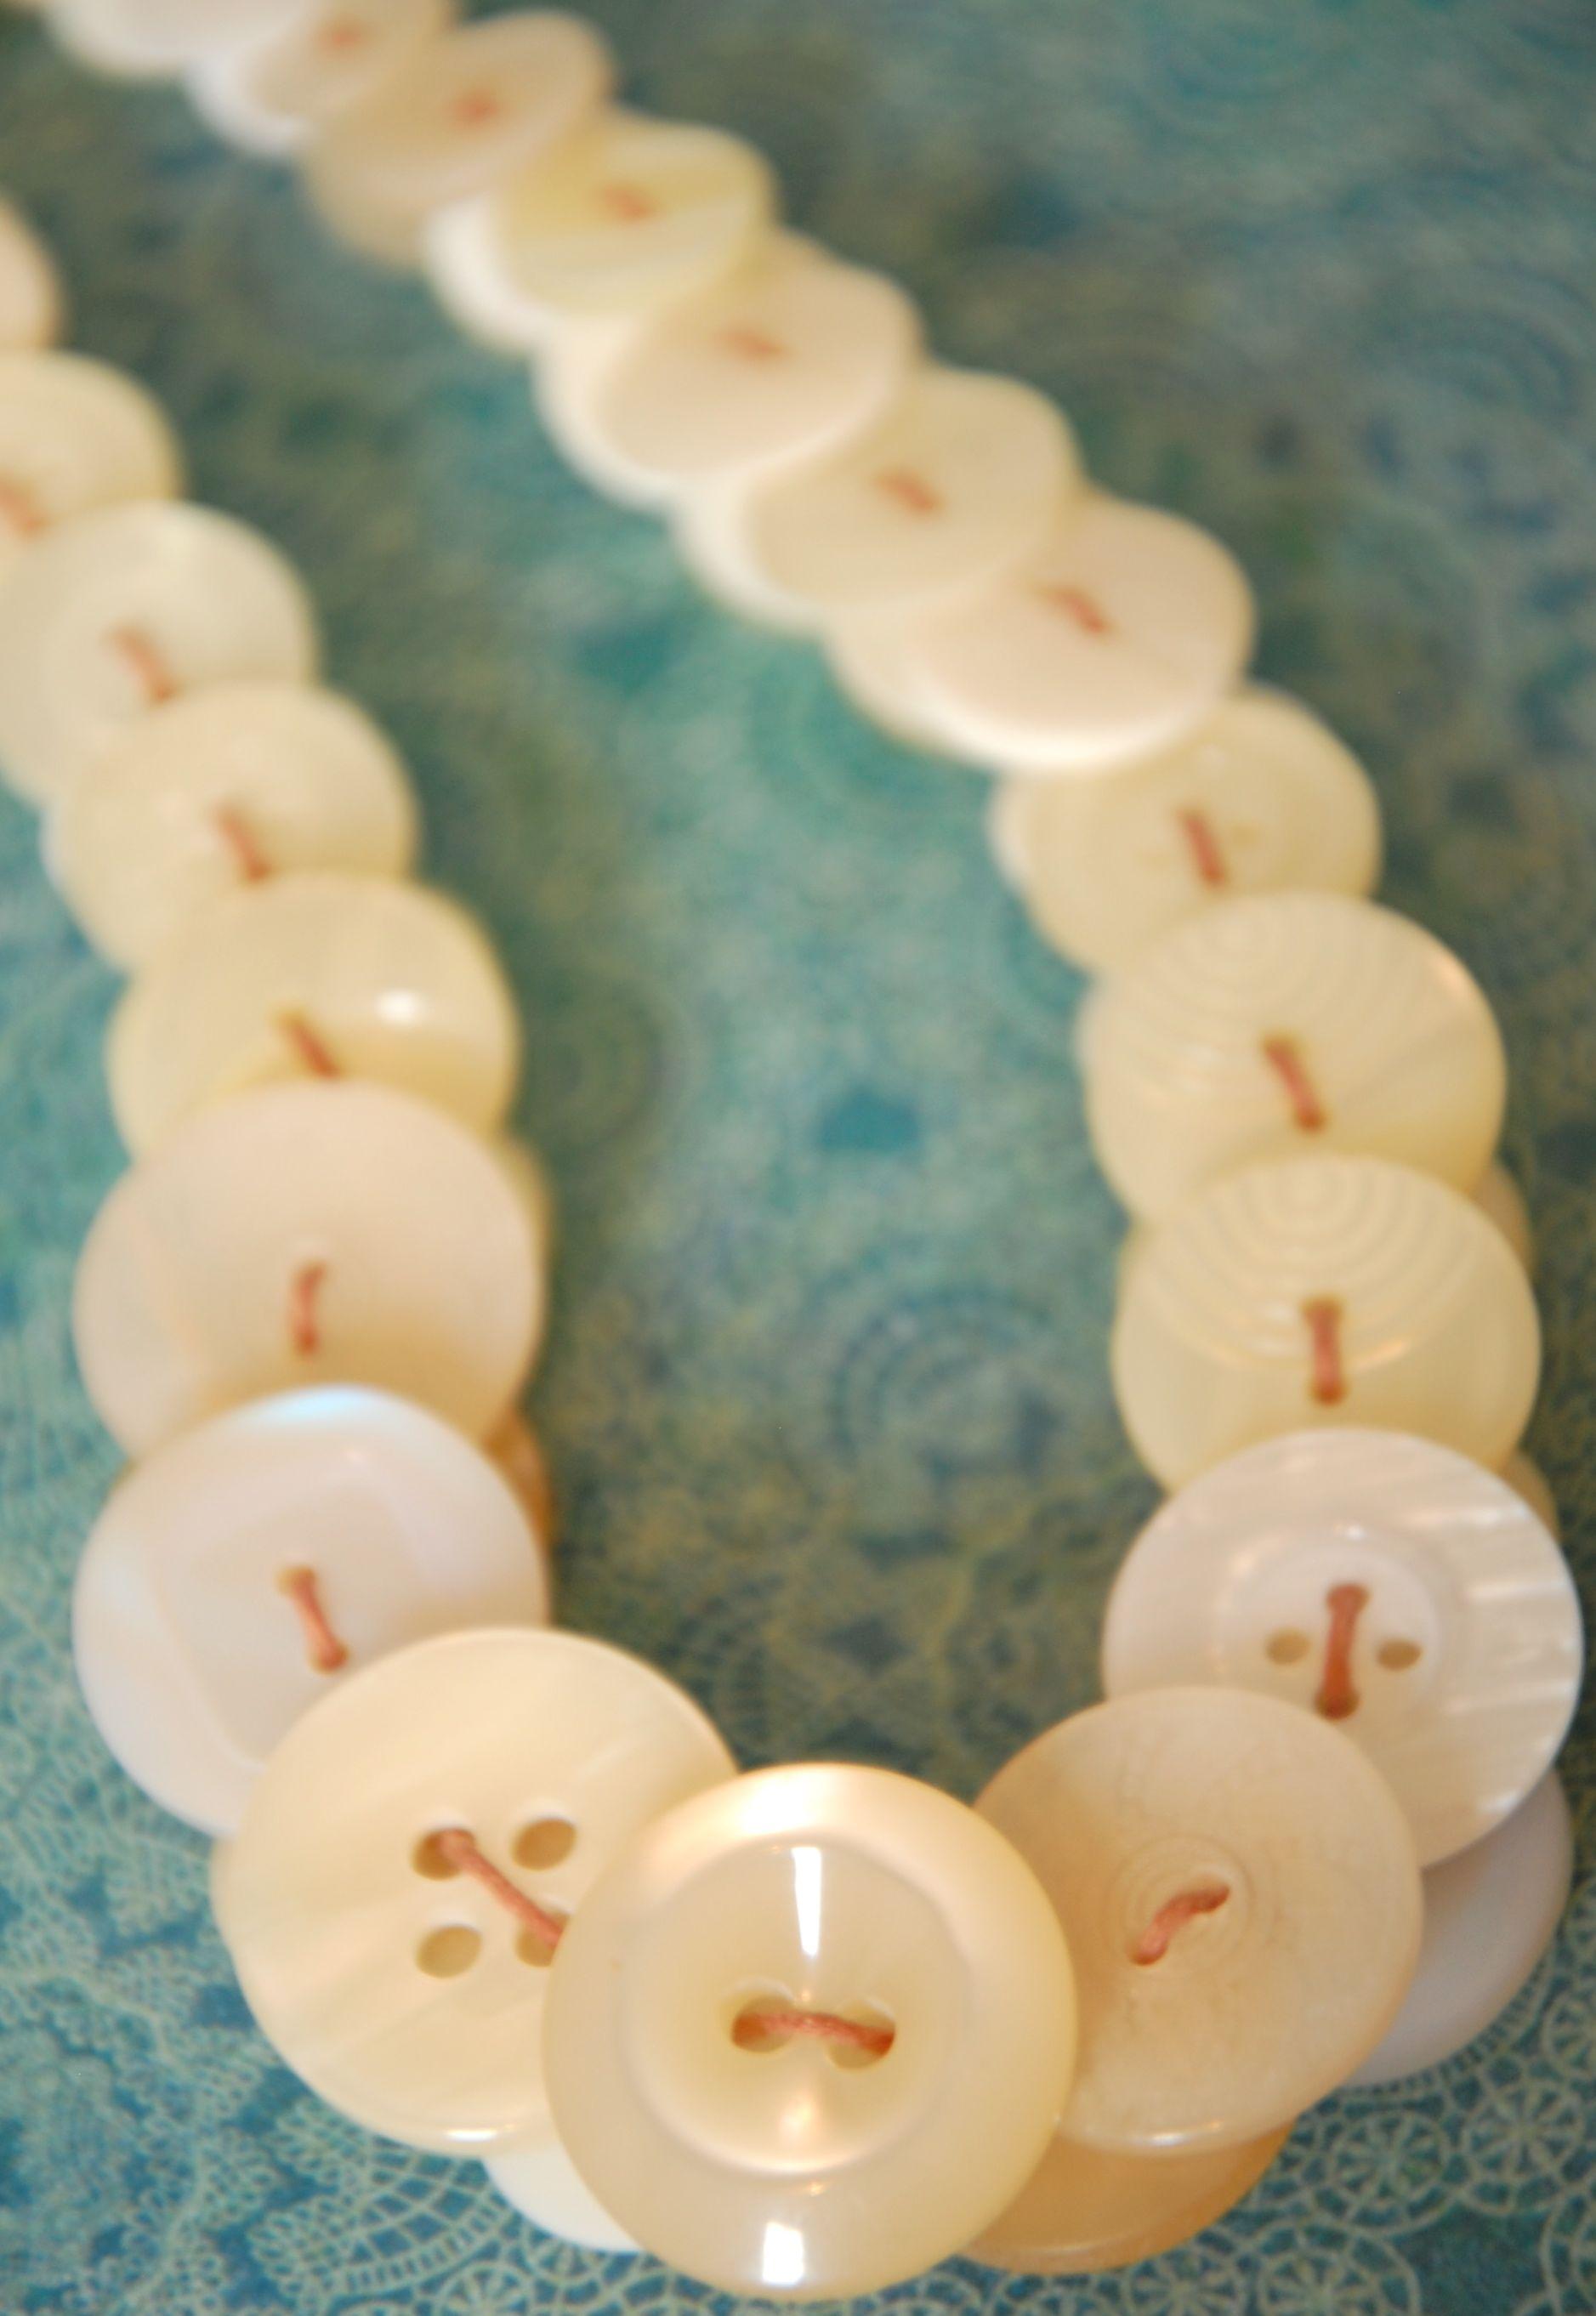 ButtonCompany Jewellery Kits